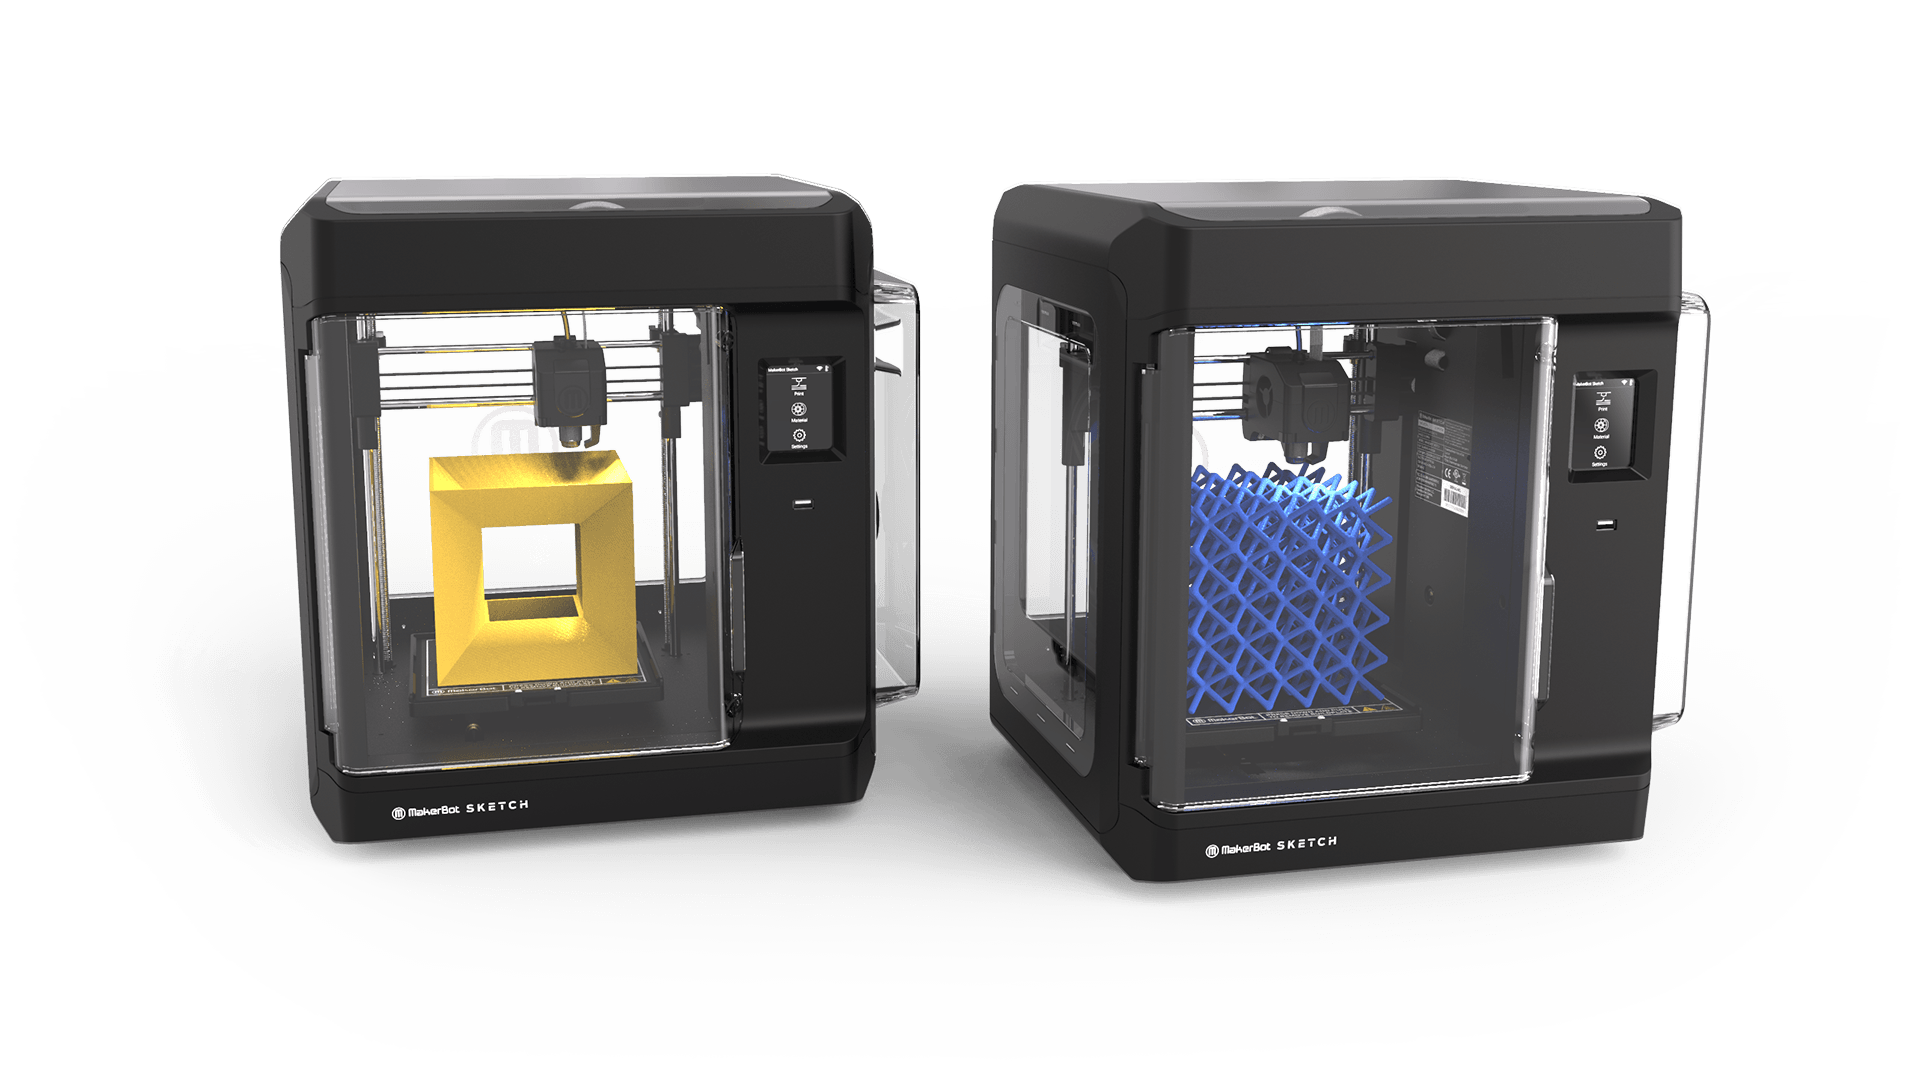 SKETCH Classroom 3D printers. Image via MakerBot.